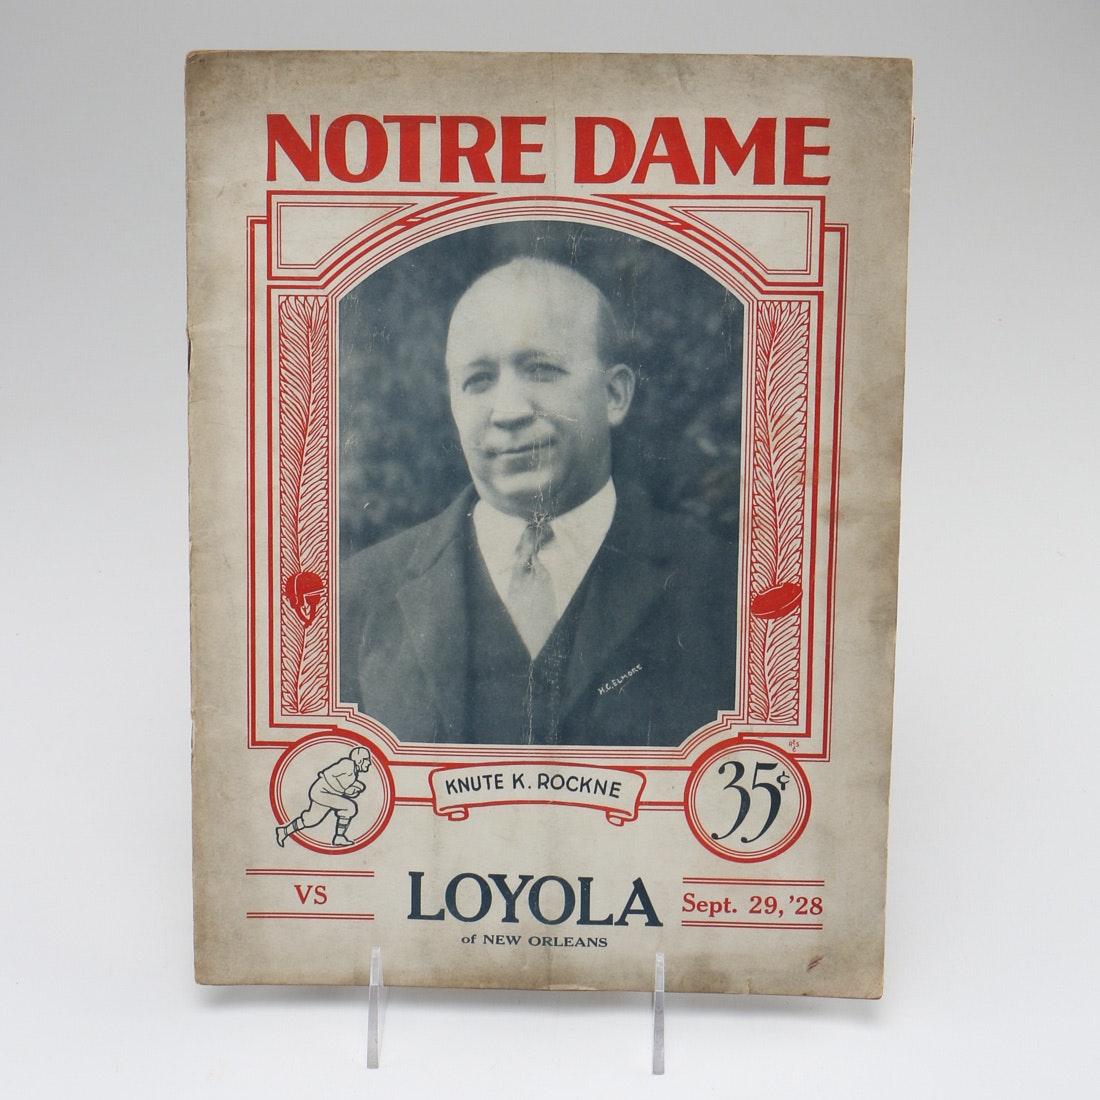 1928 Notre Dame Football Program